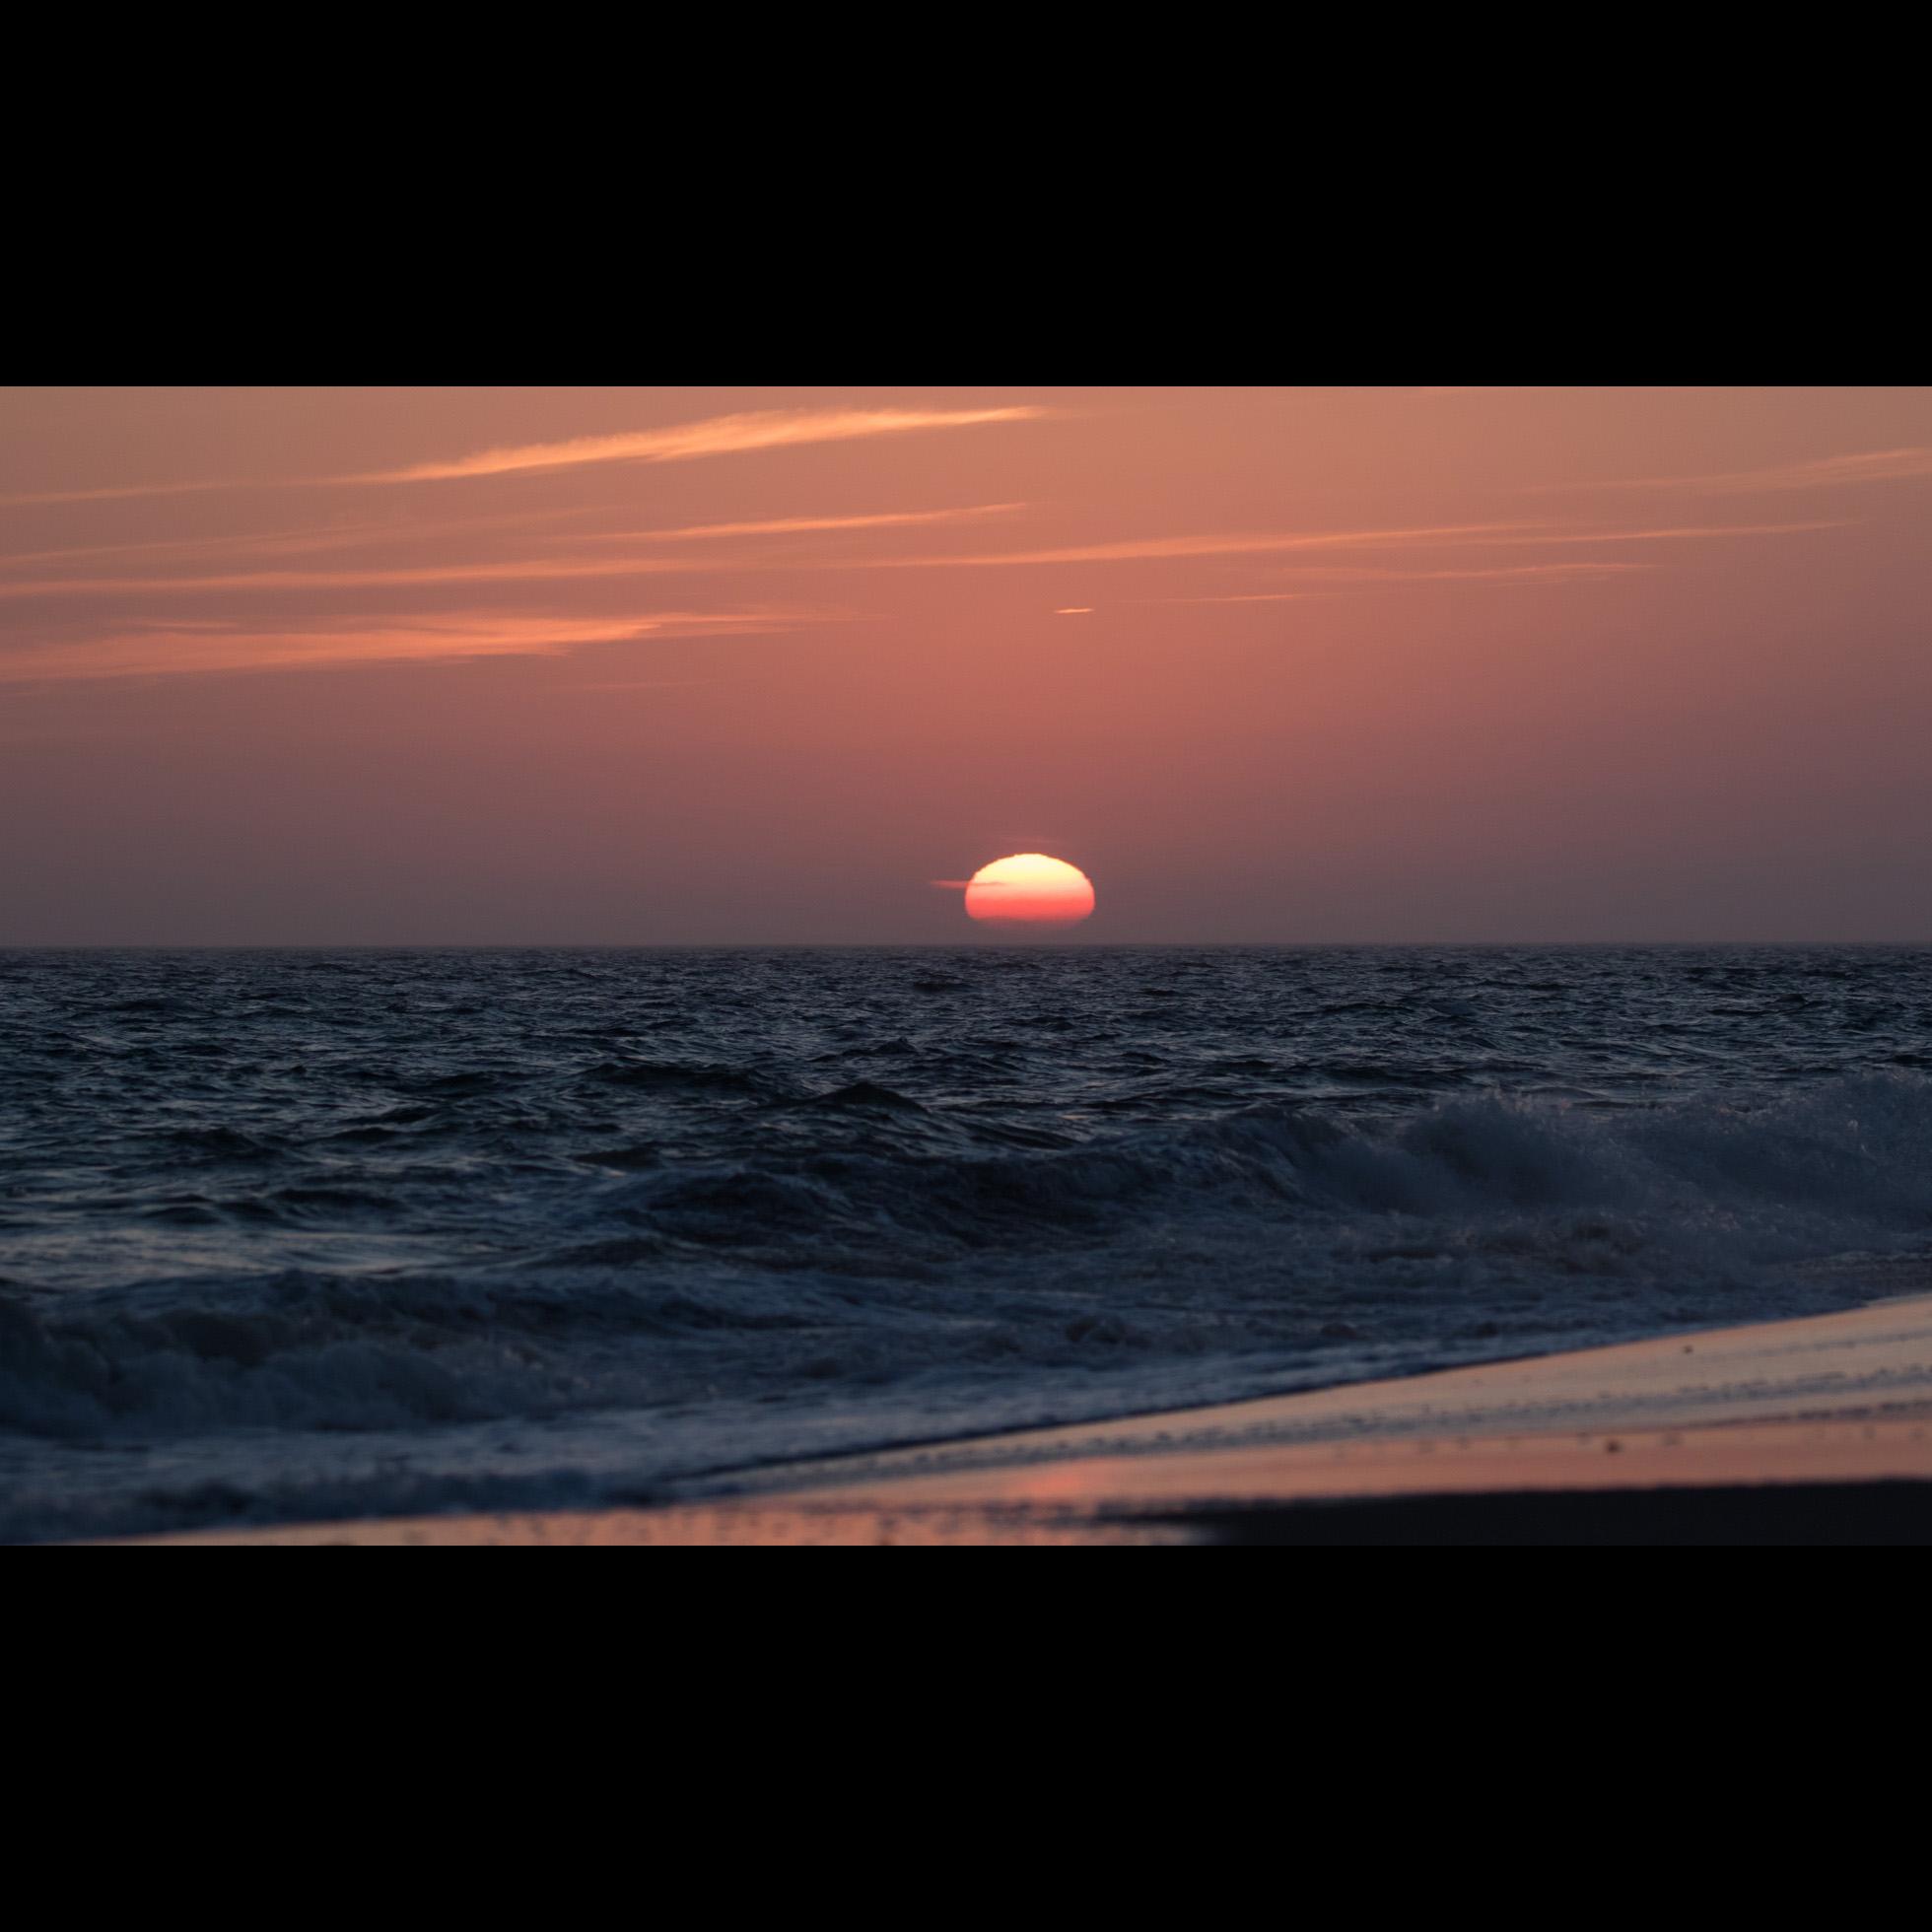 2.23 SOUTH BEACH SUNSET